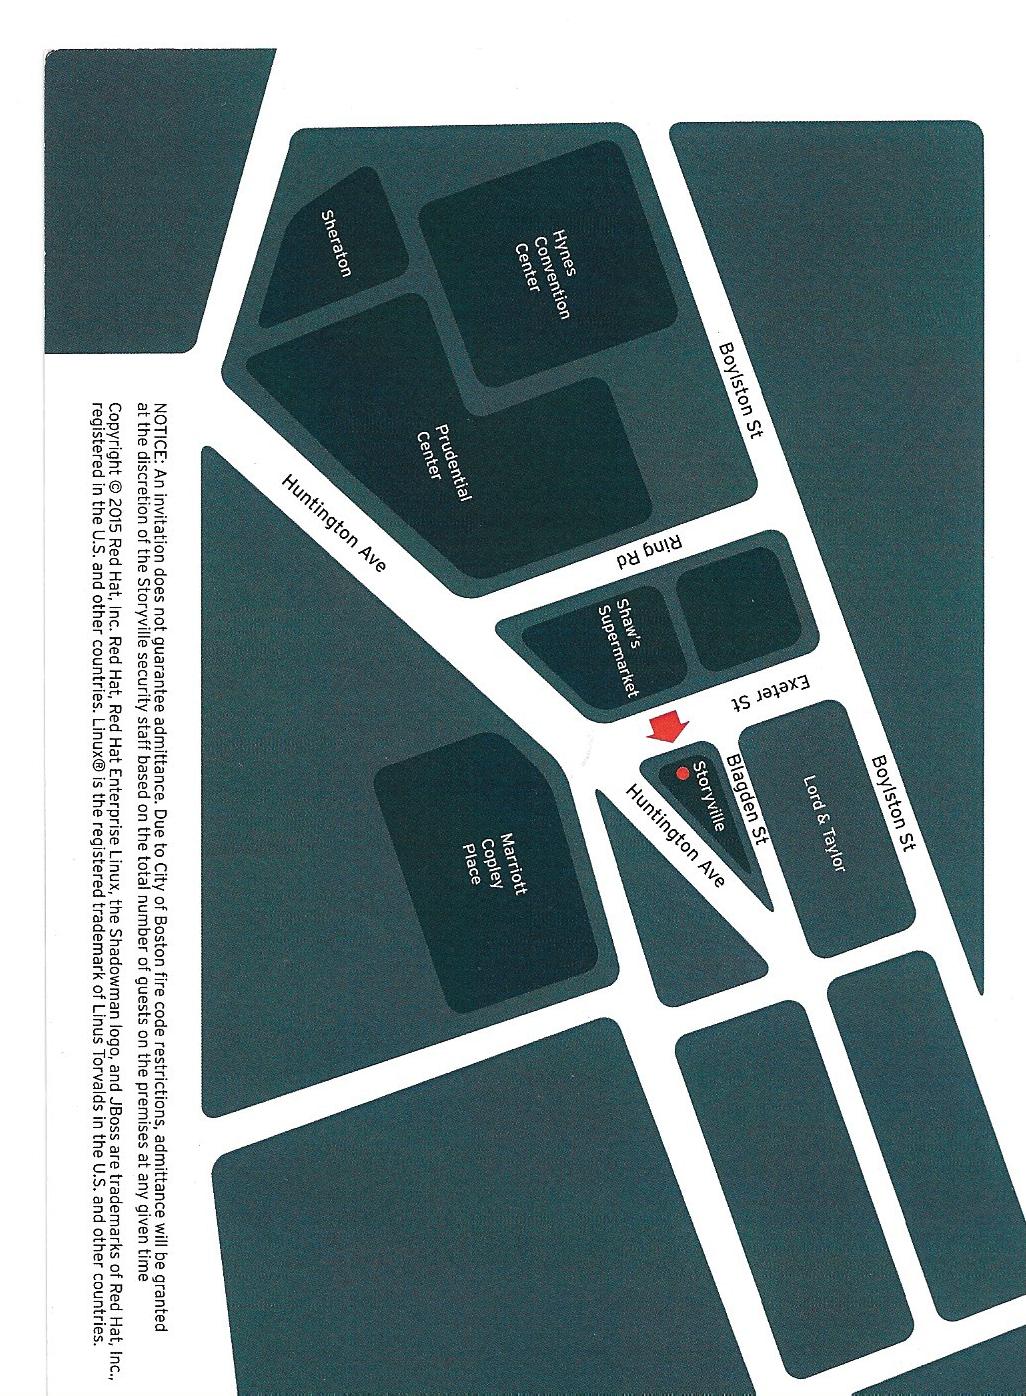 OpenShift_summit_2015_postcard_back_map